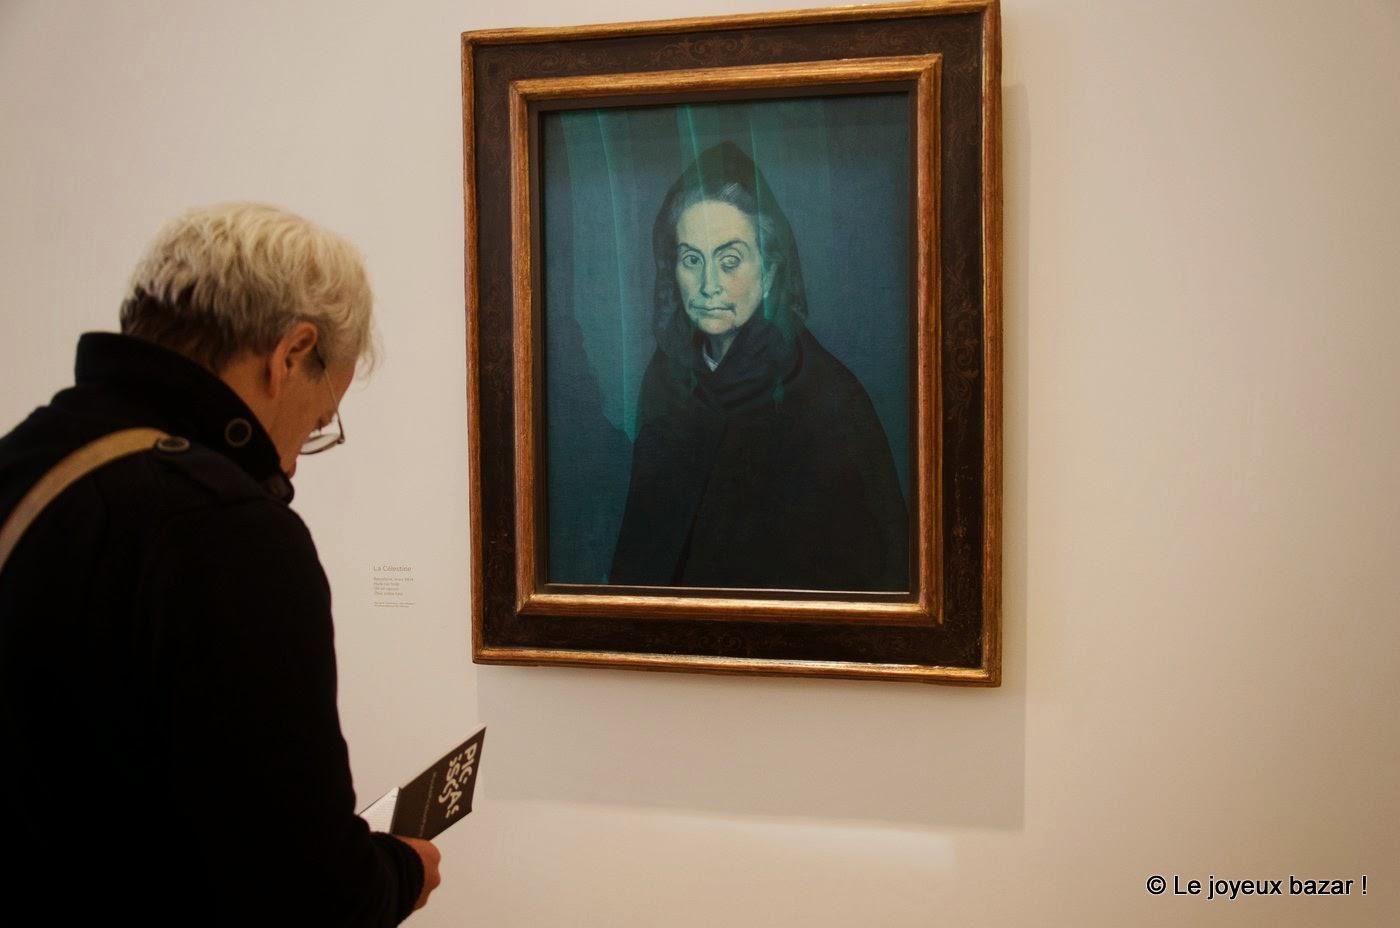 Musee Picasso - Paris - La Celestine